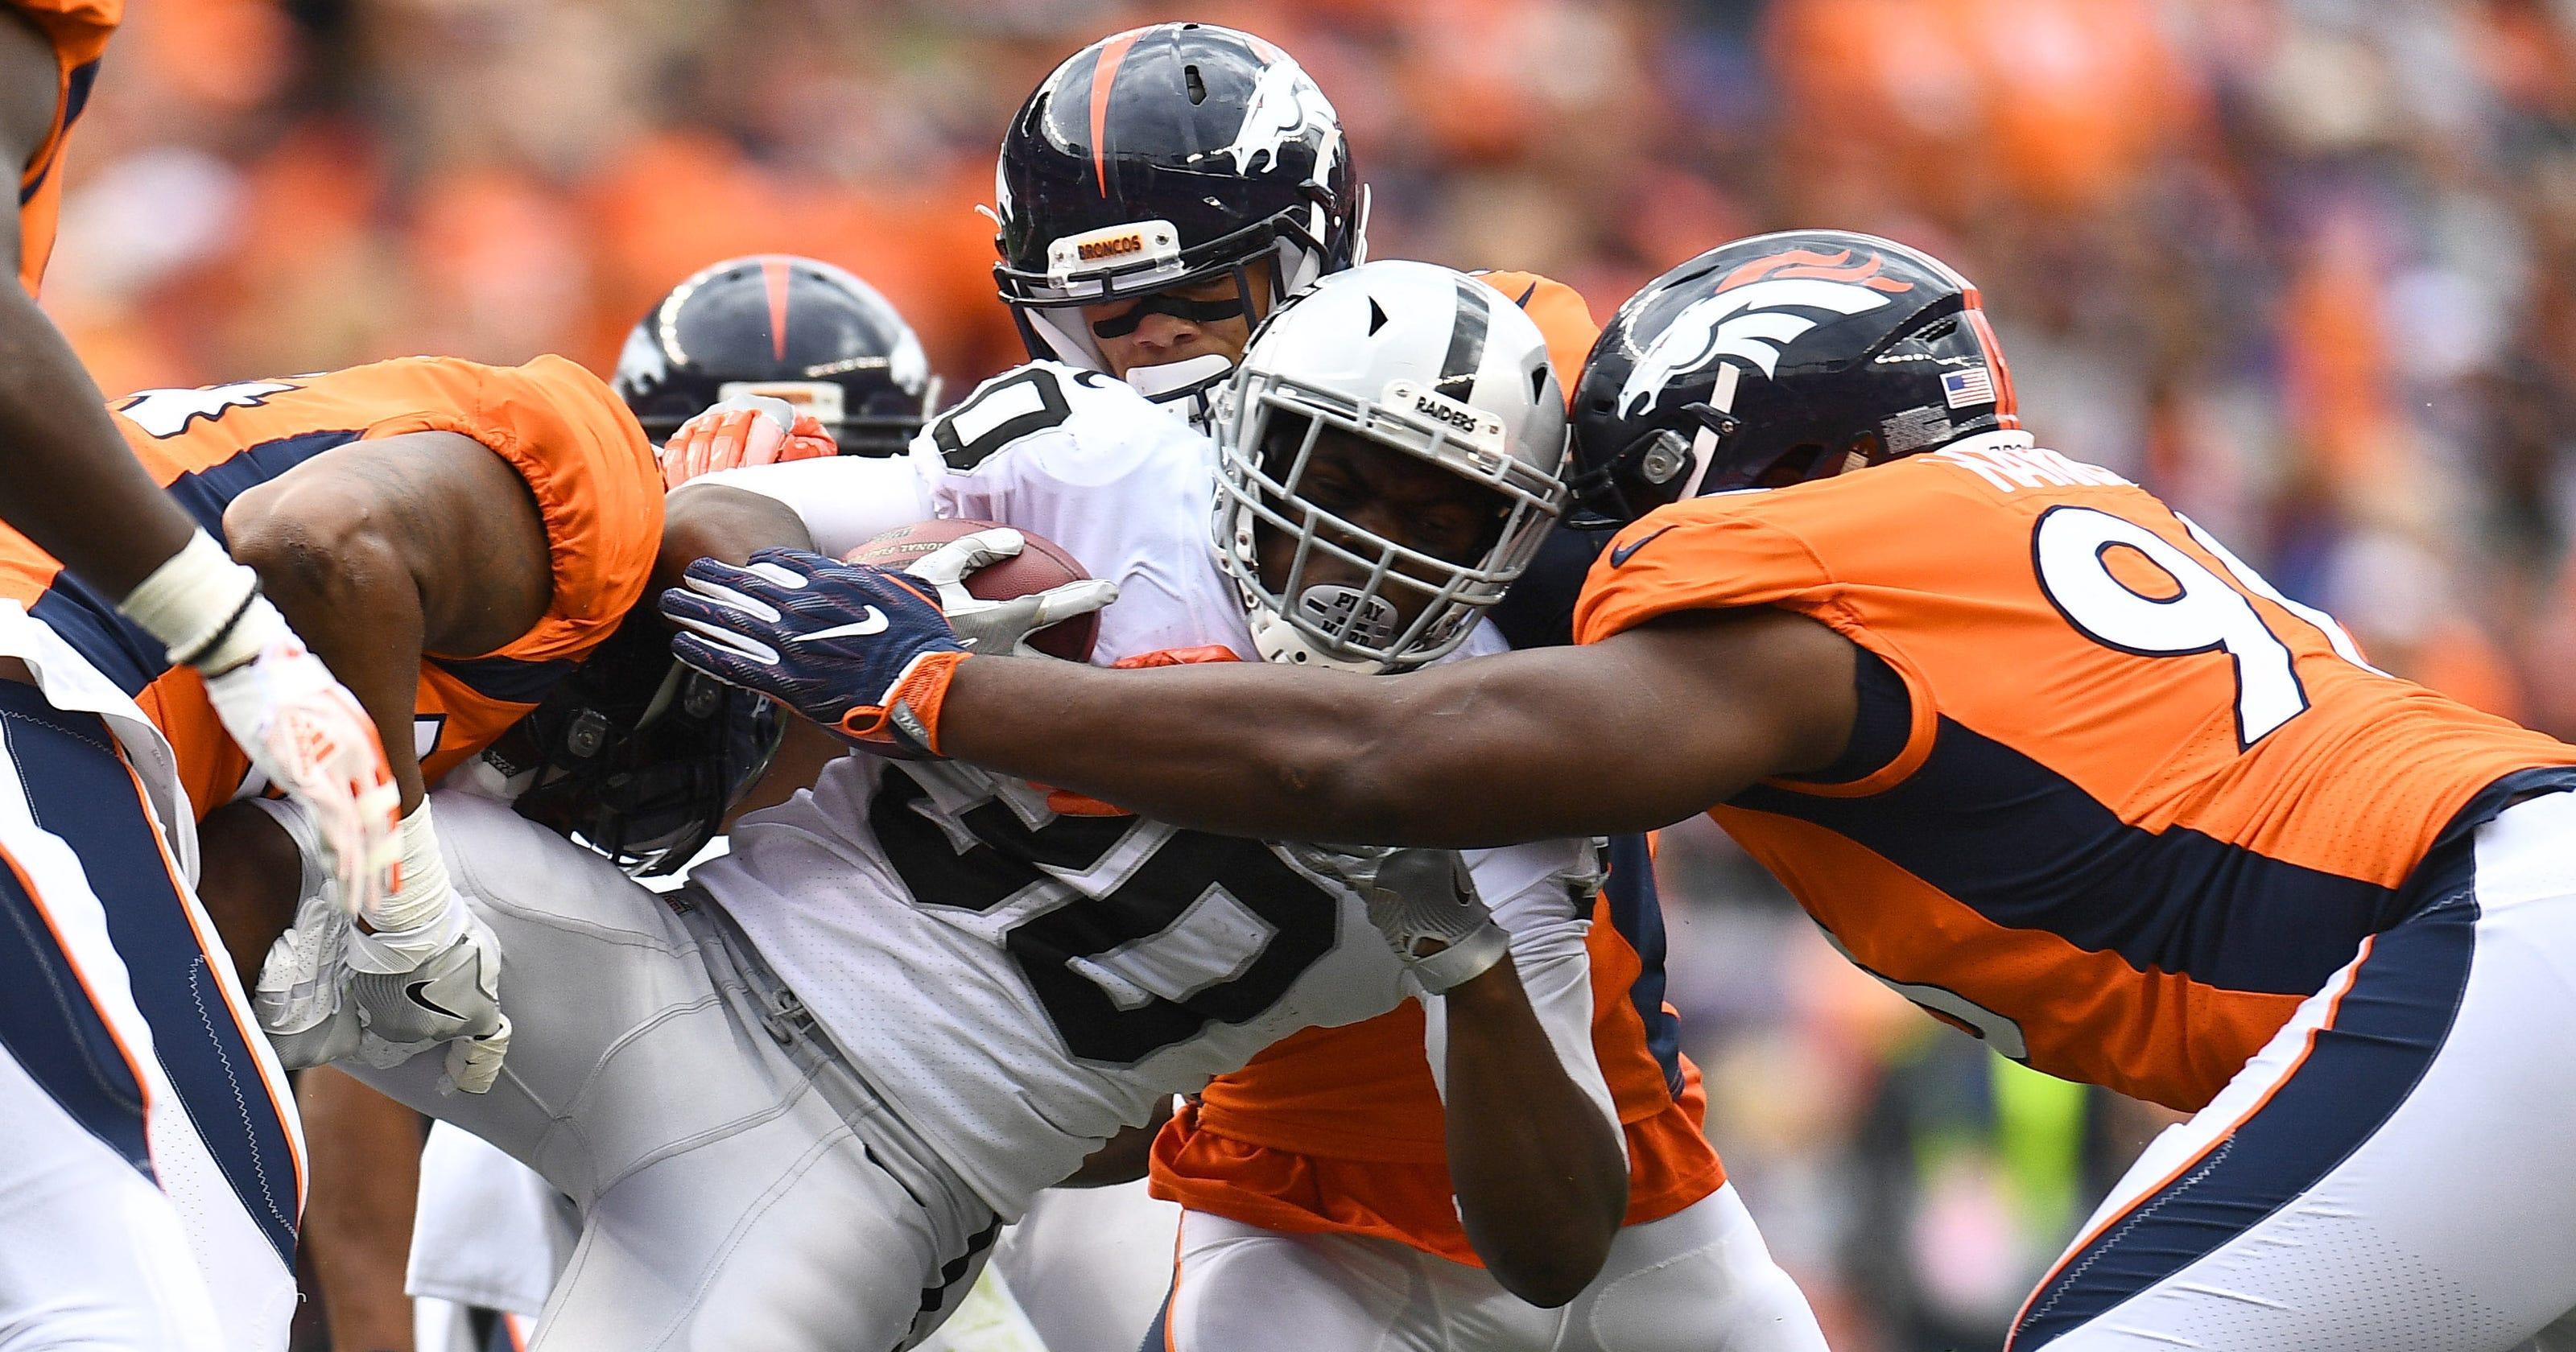 dfd69f0a349 Broncos  defense swarms Raiders in bounceback win